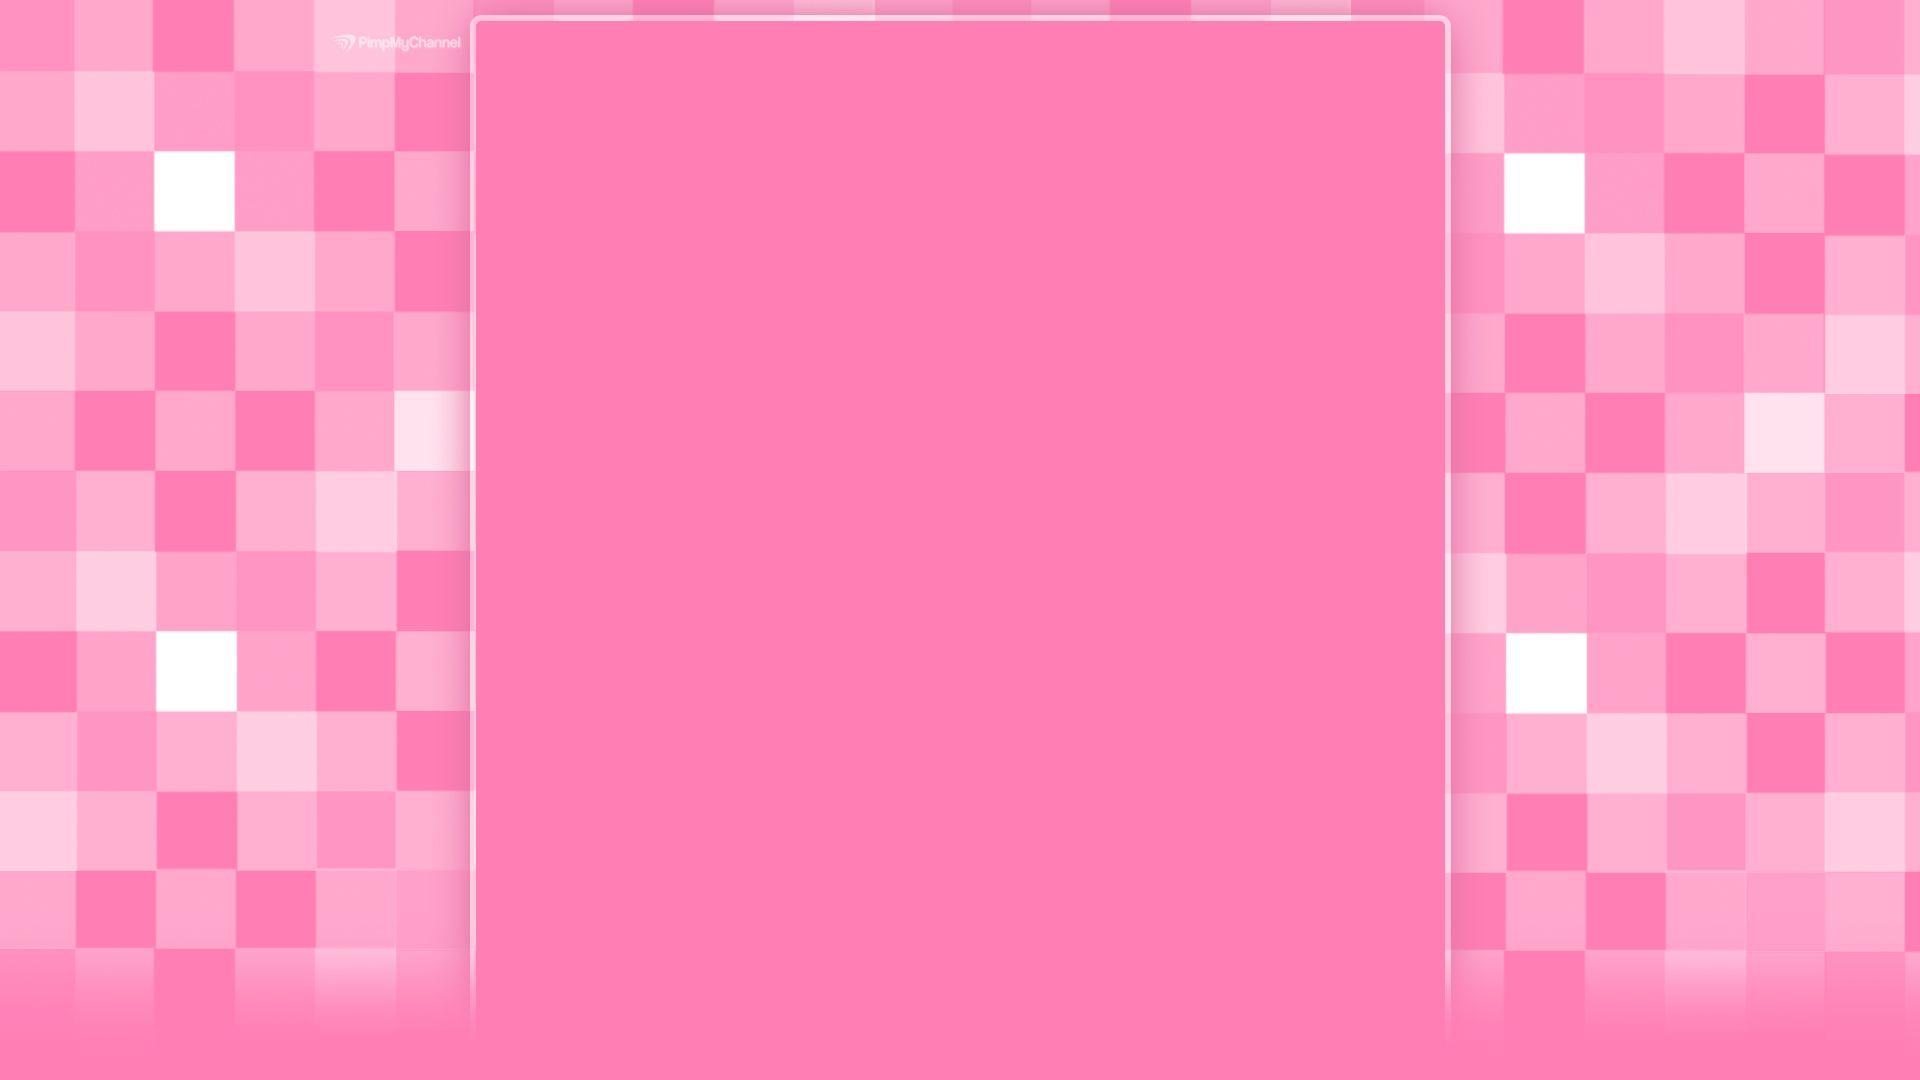 Top Wallpaper Minecraft Cute - 8ec7305f430480b5b5a1f790a513baa2  Collection_172553.jpg